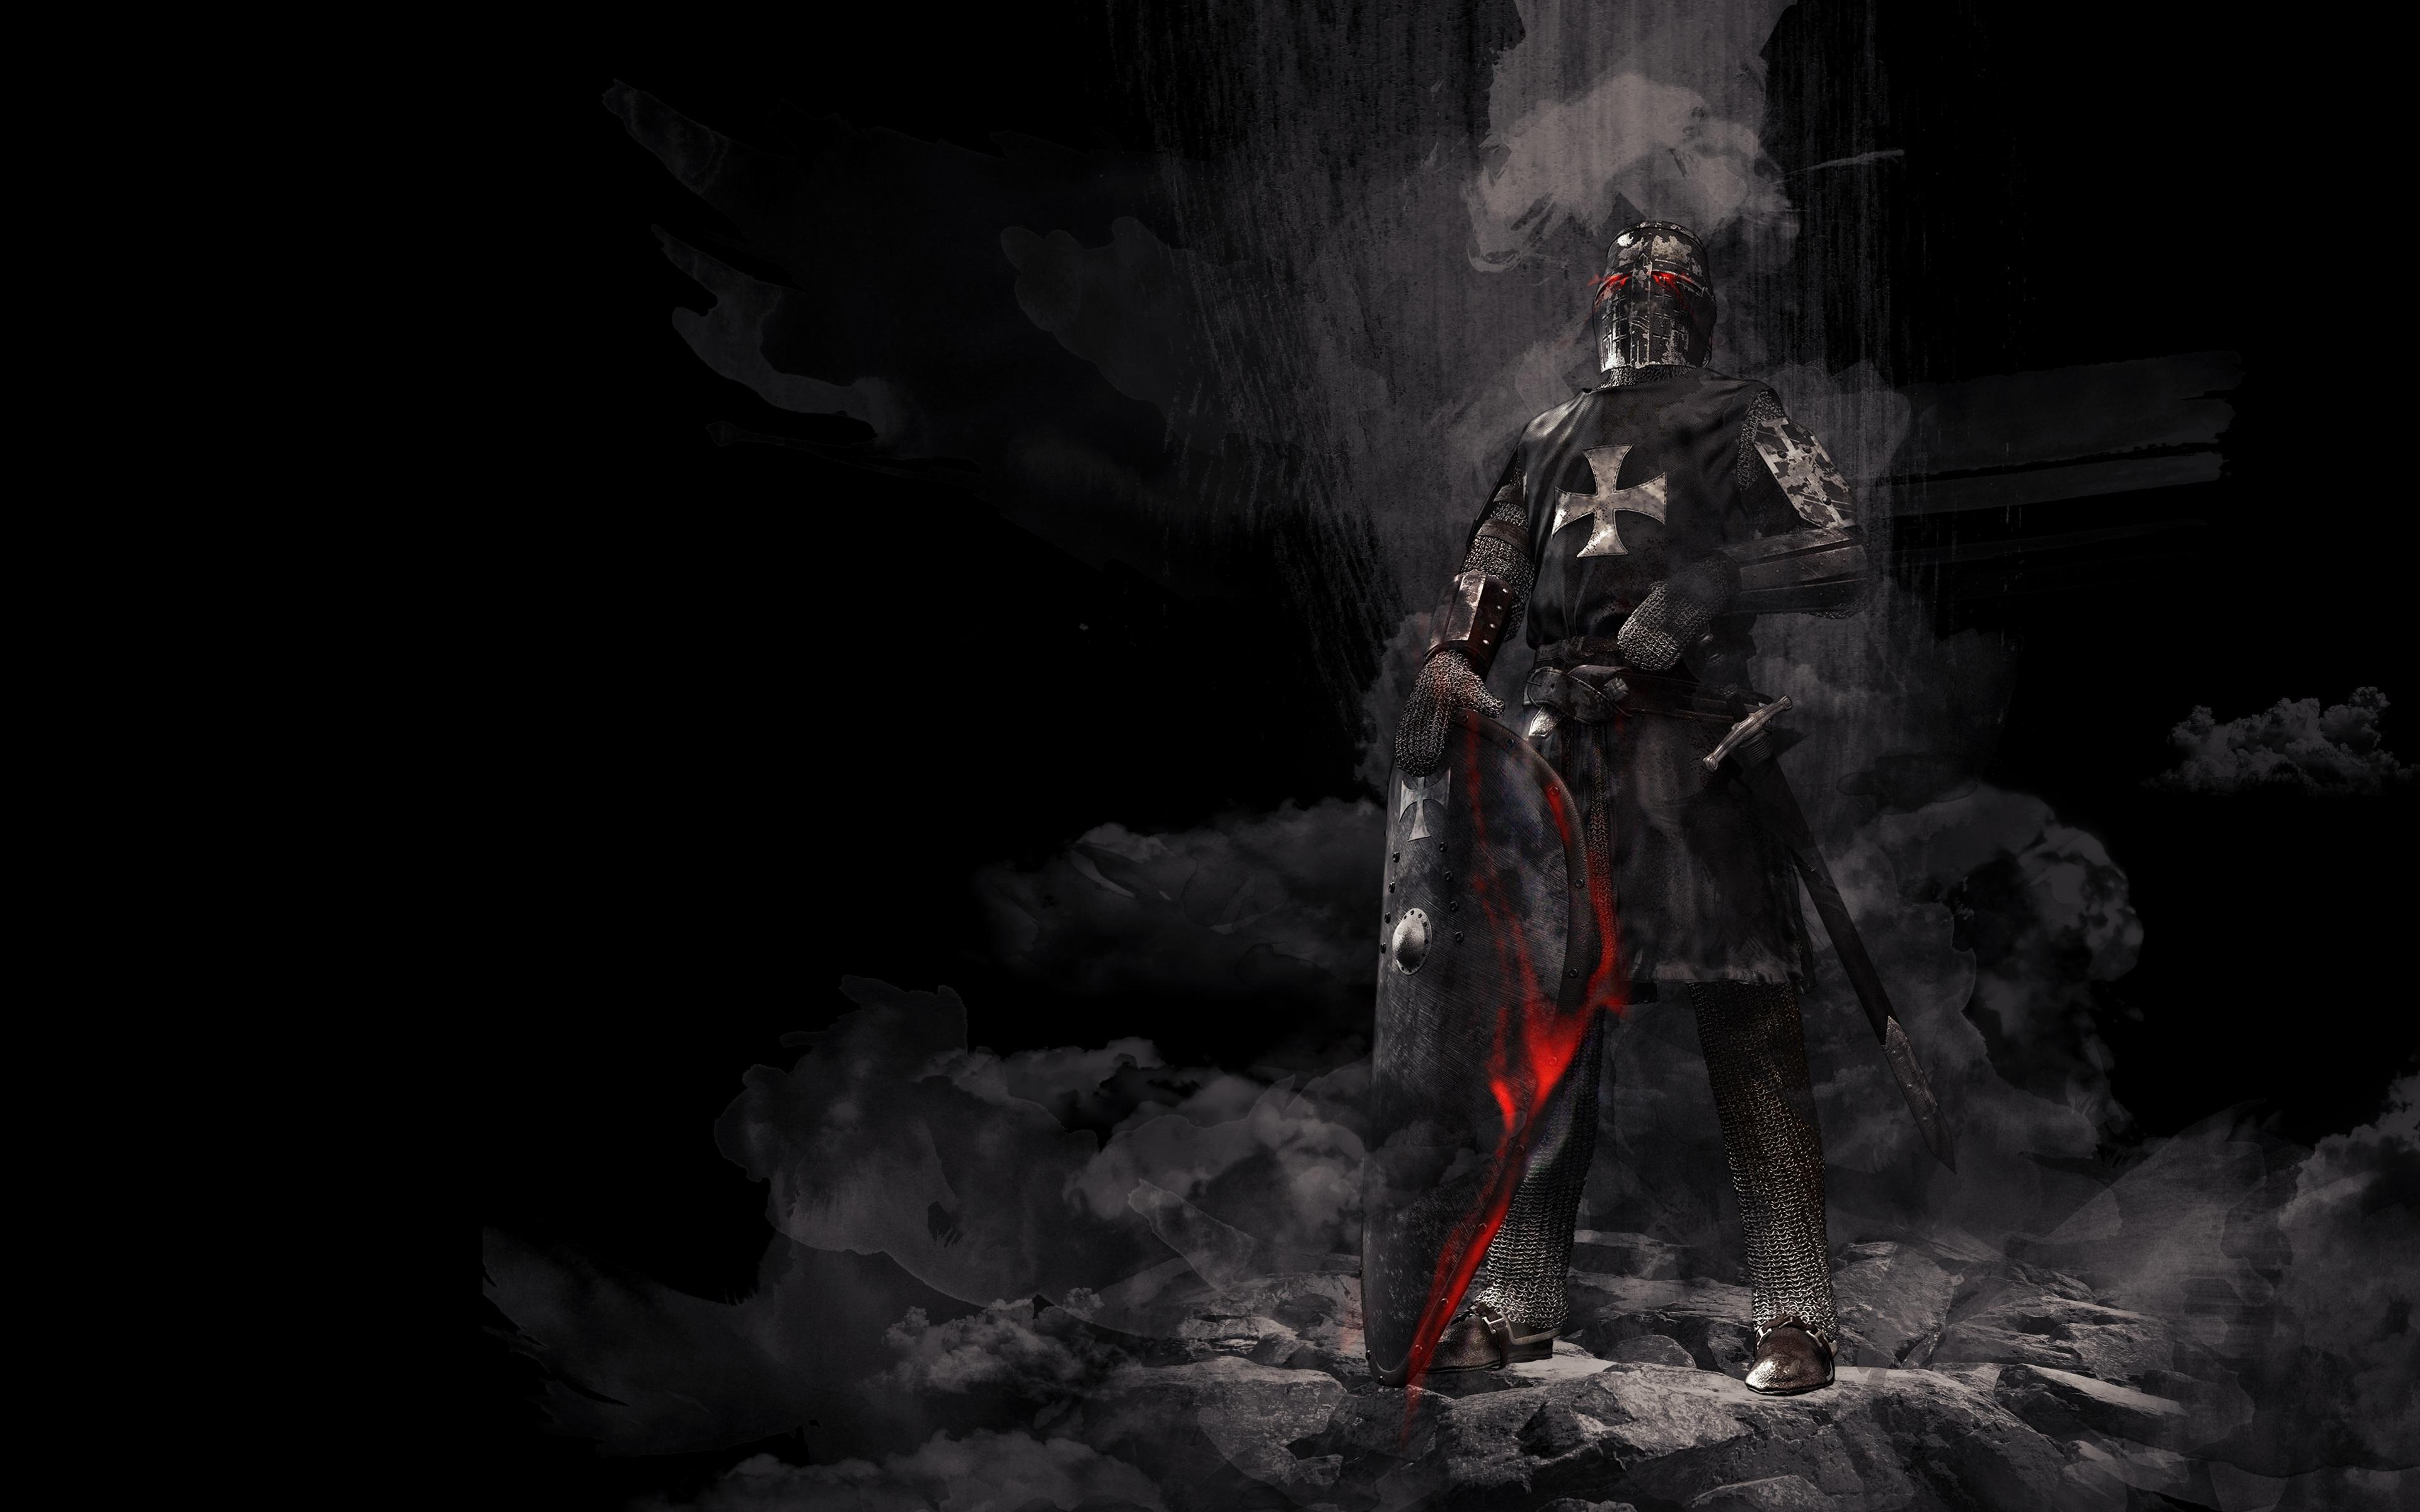 Dark Knight 4k Ultra HD Wallpaper And Background Image